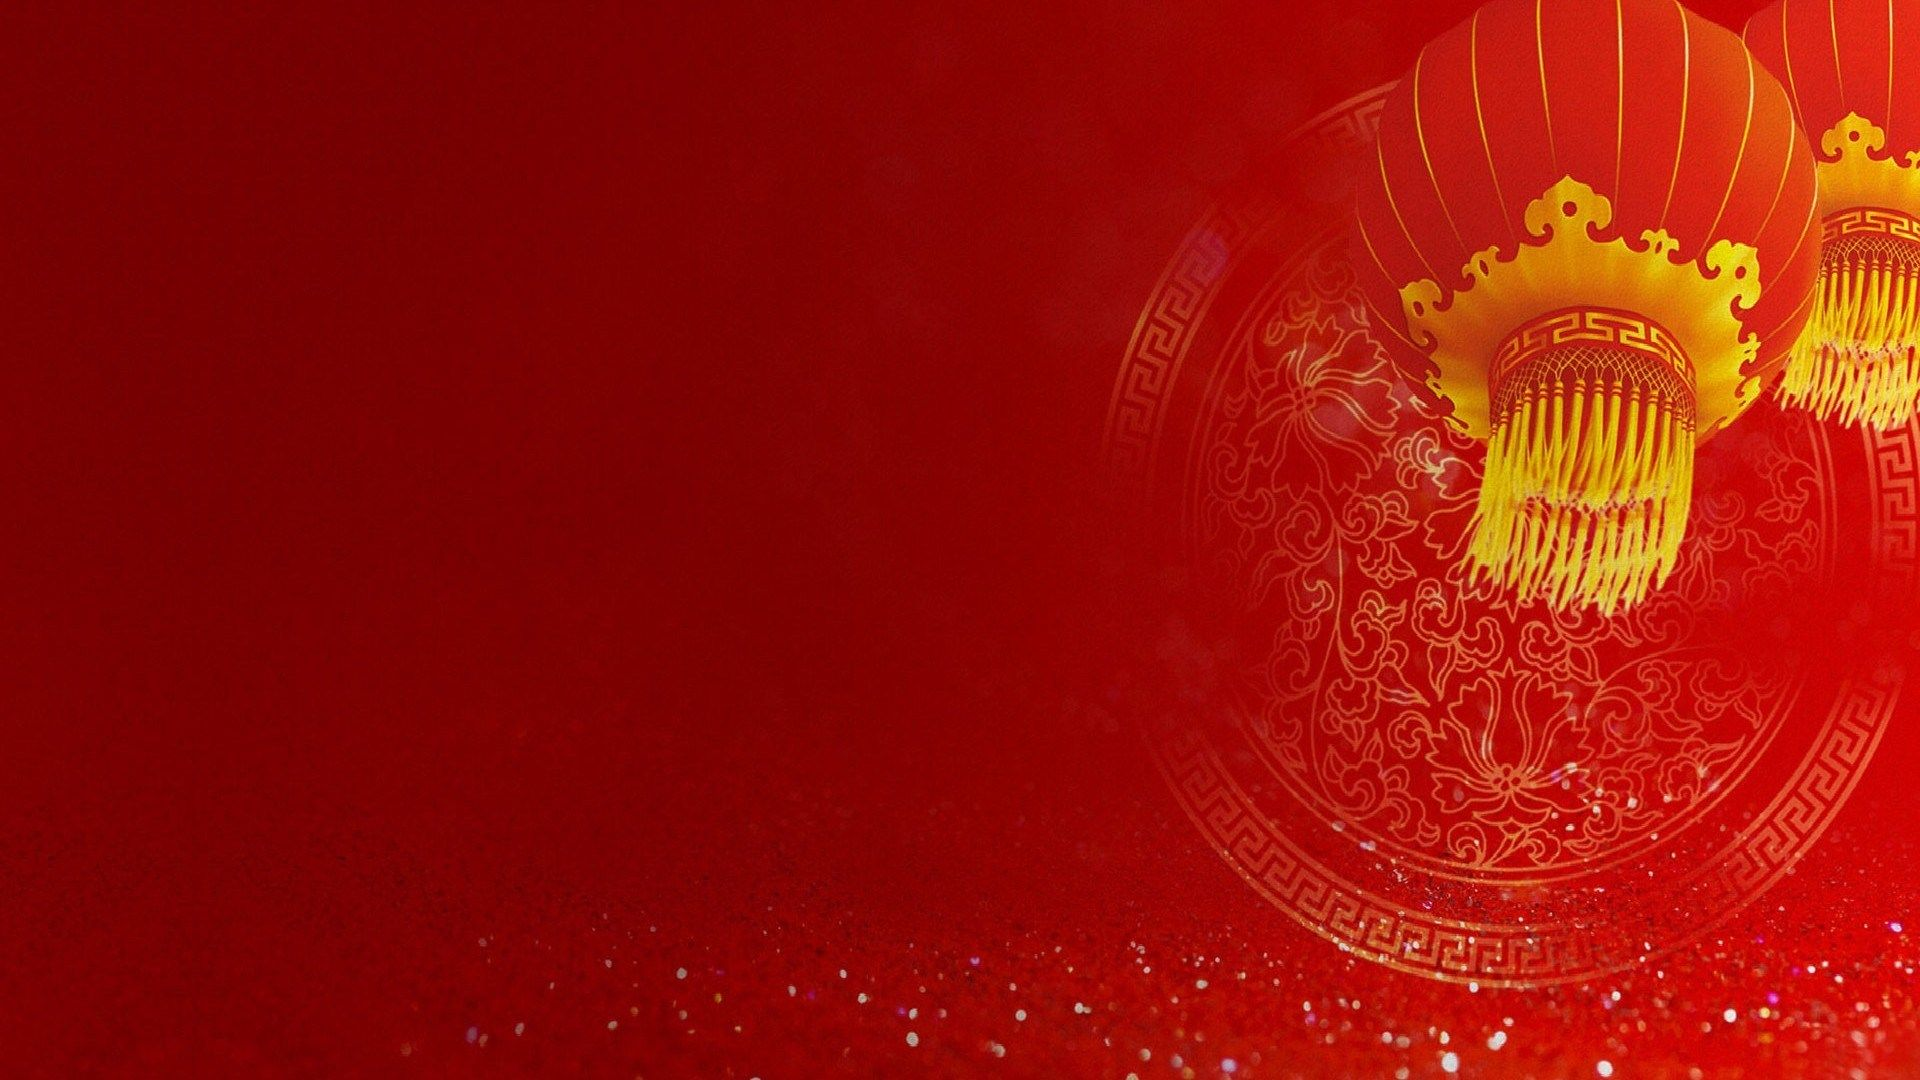 free download chinese wallpaper 1 free download chinese wallpaper 1 chinese new year background